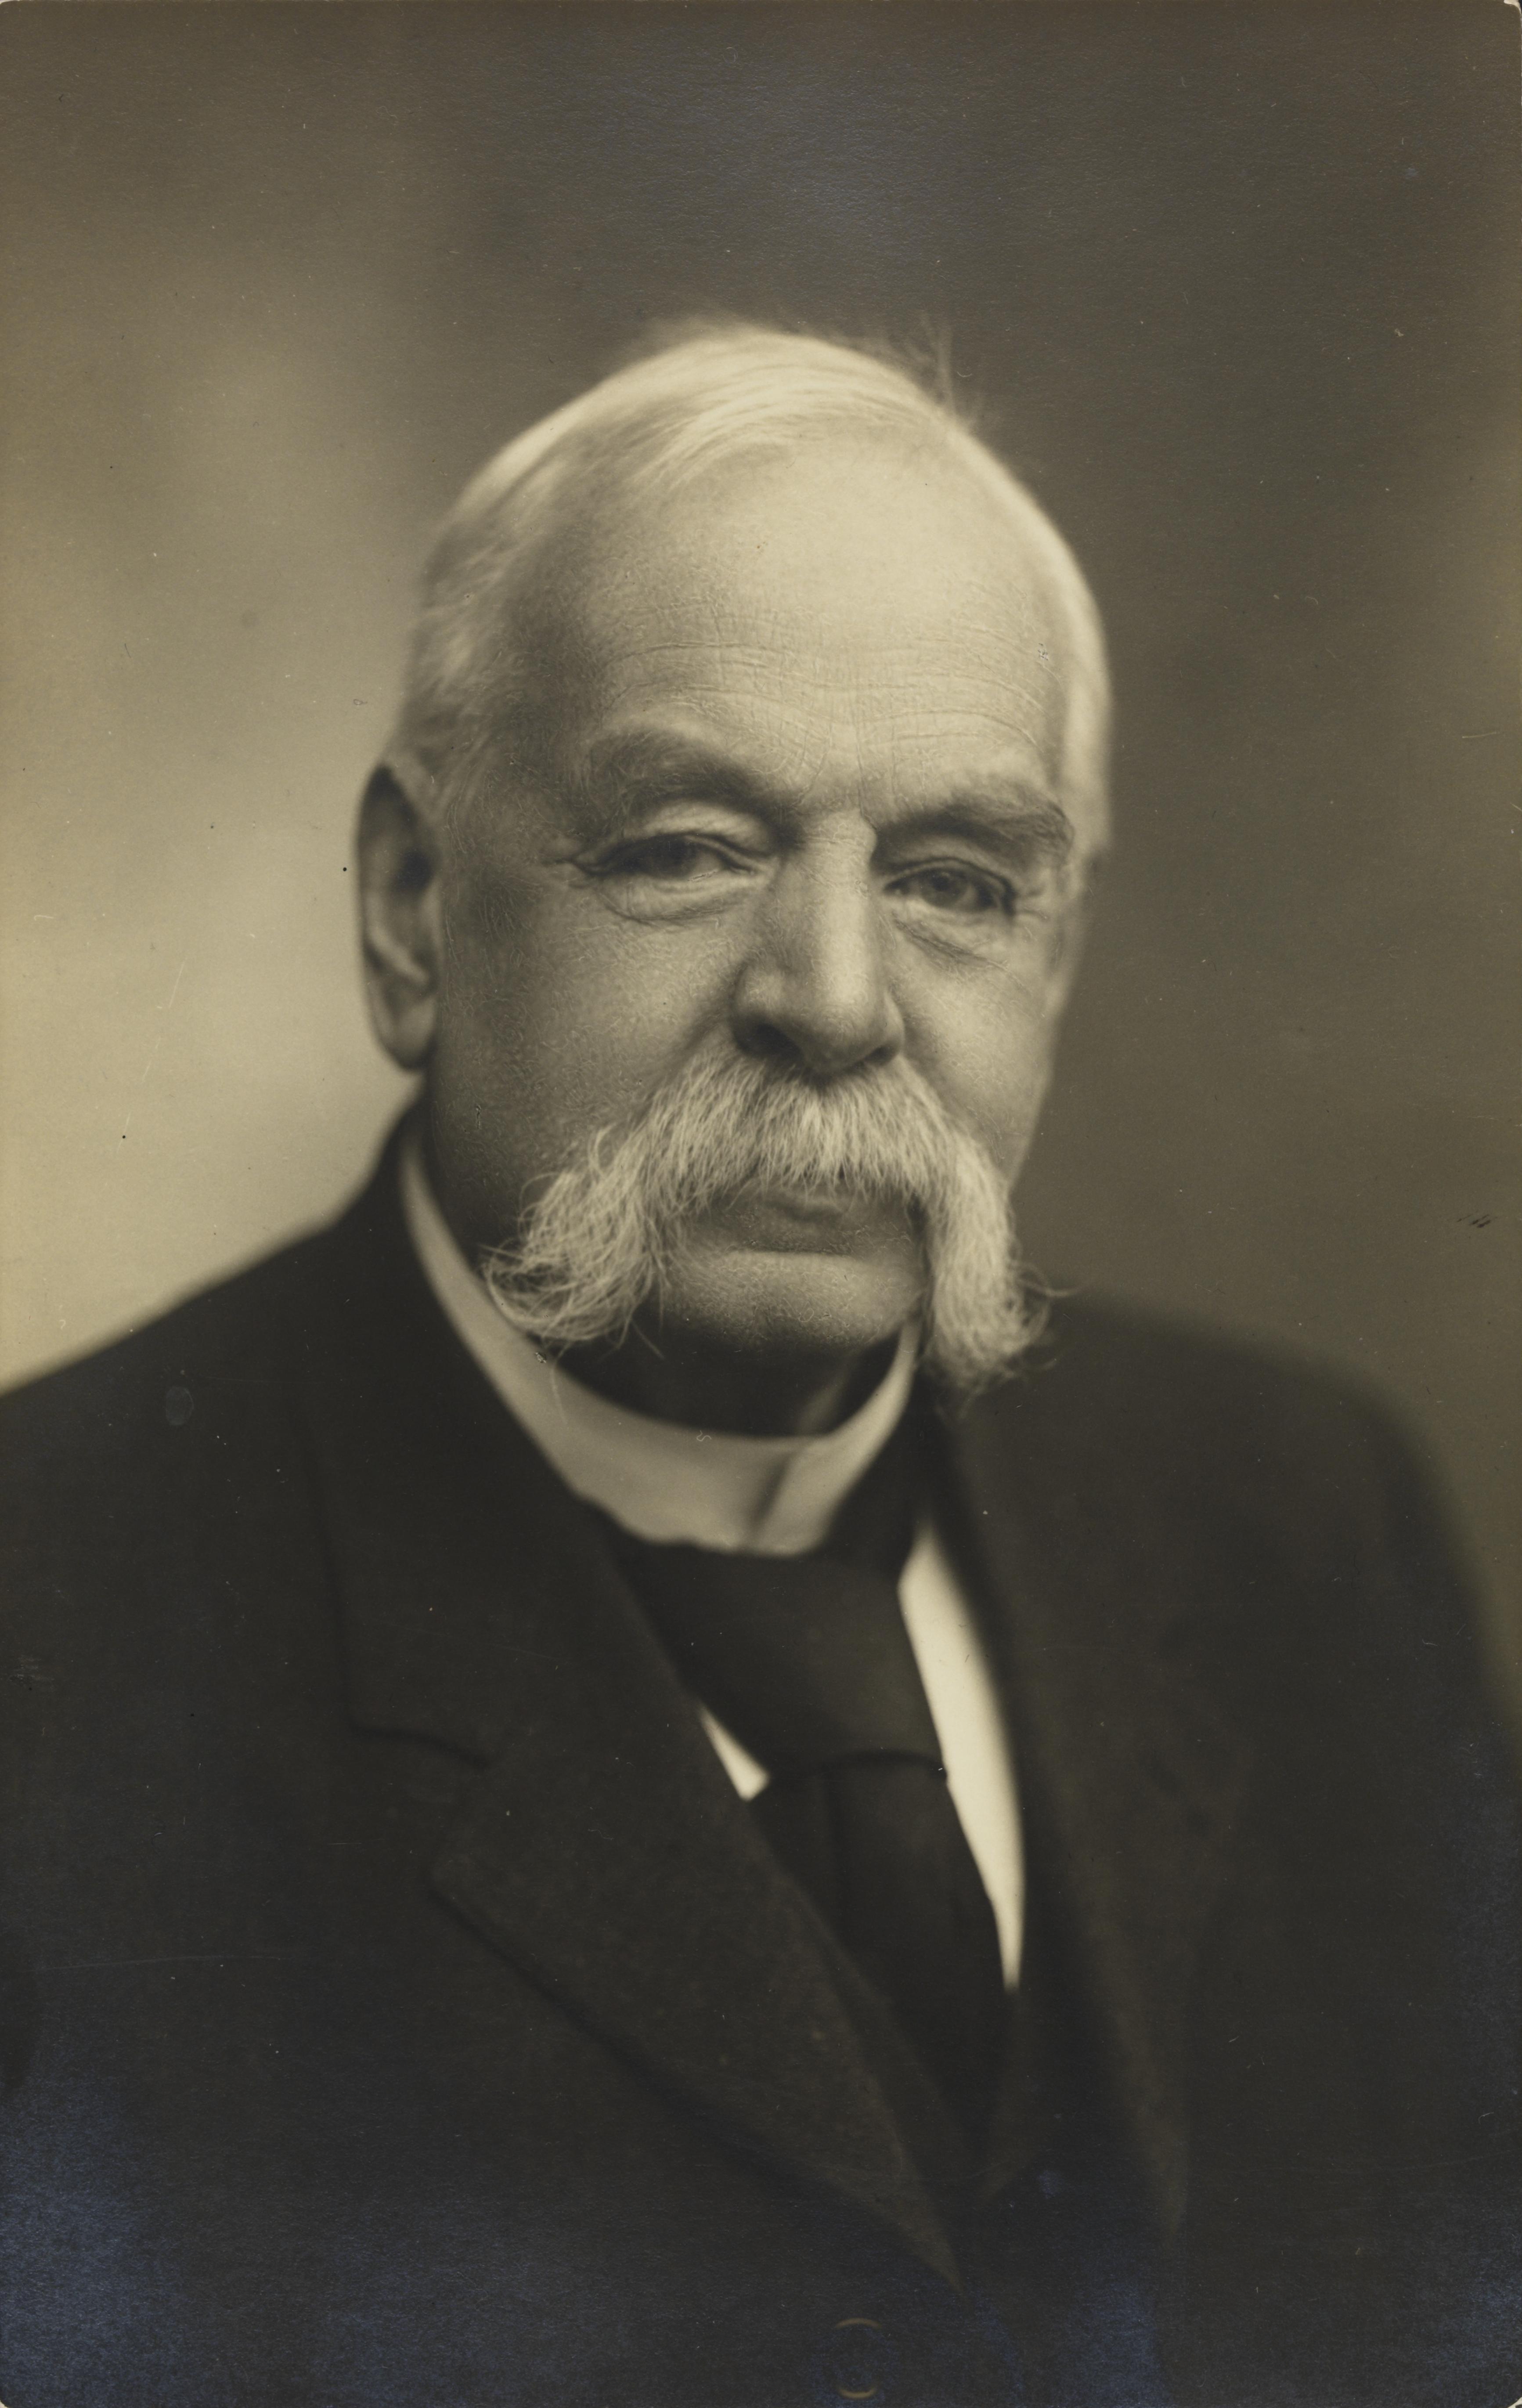 Image of Christian Samuel Eyde from Wikidata